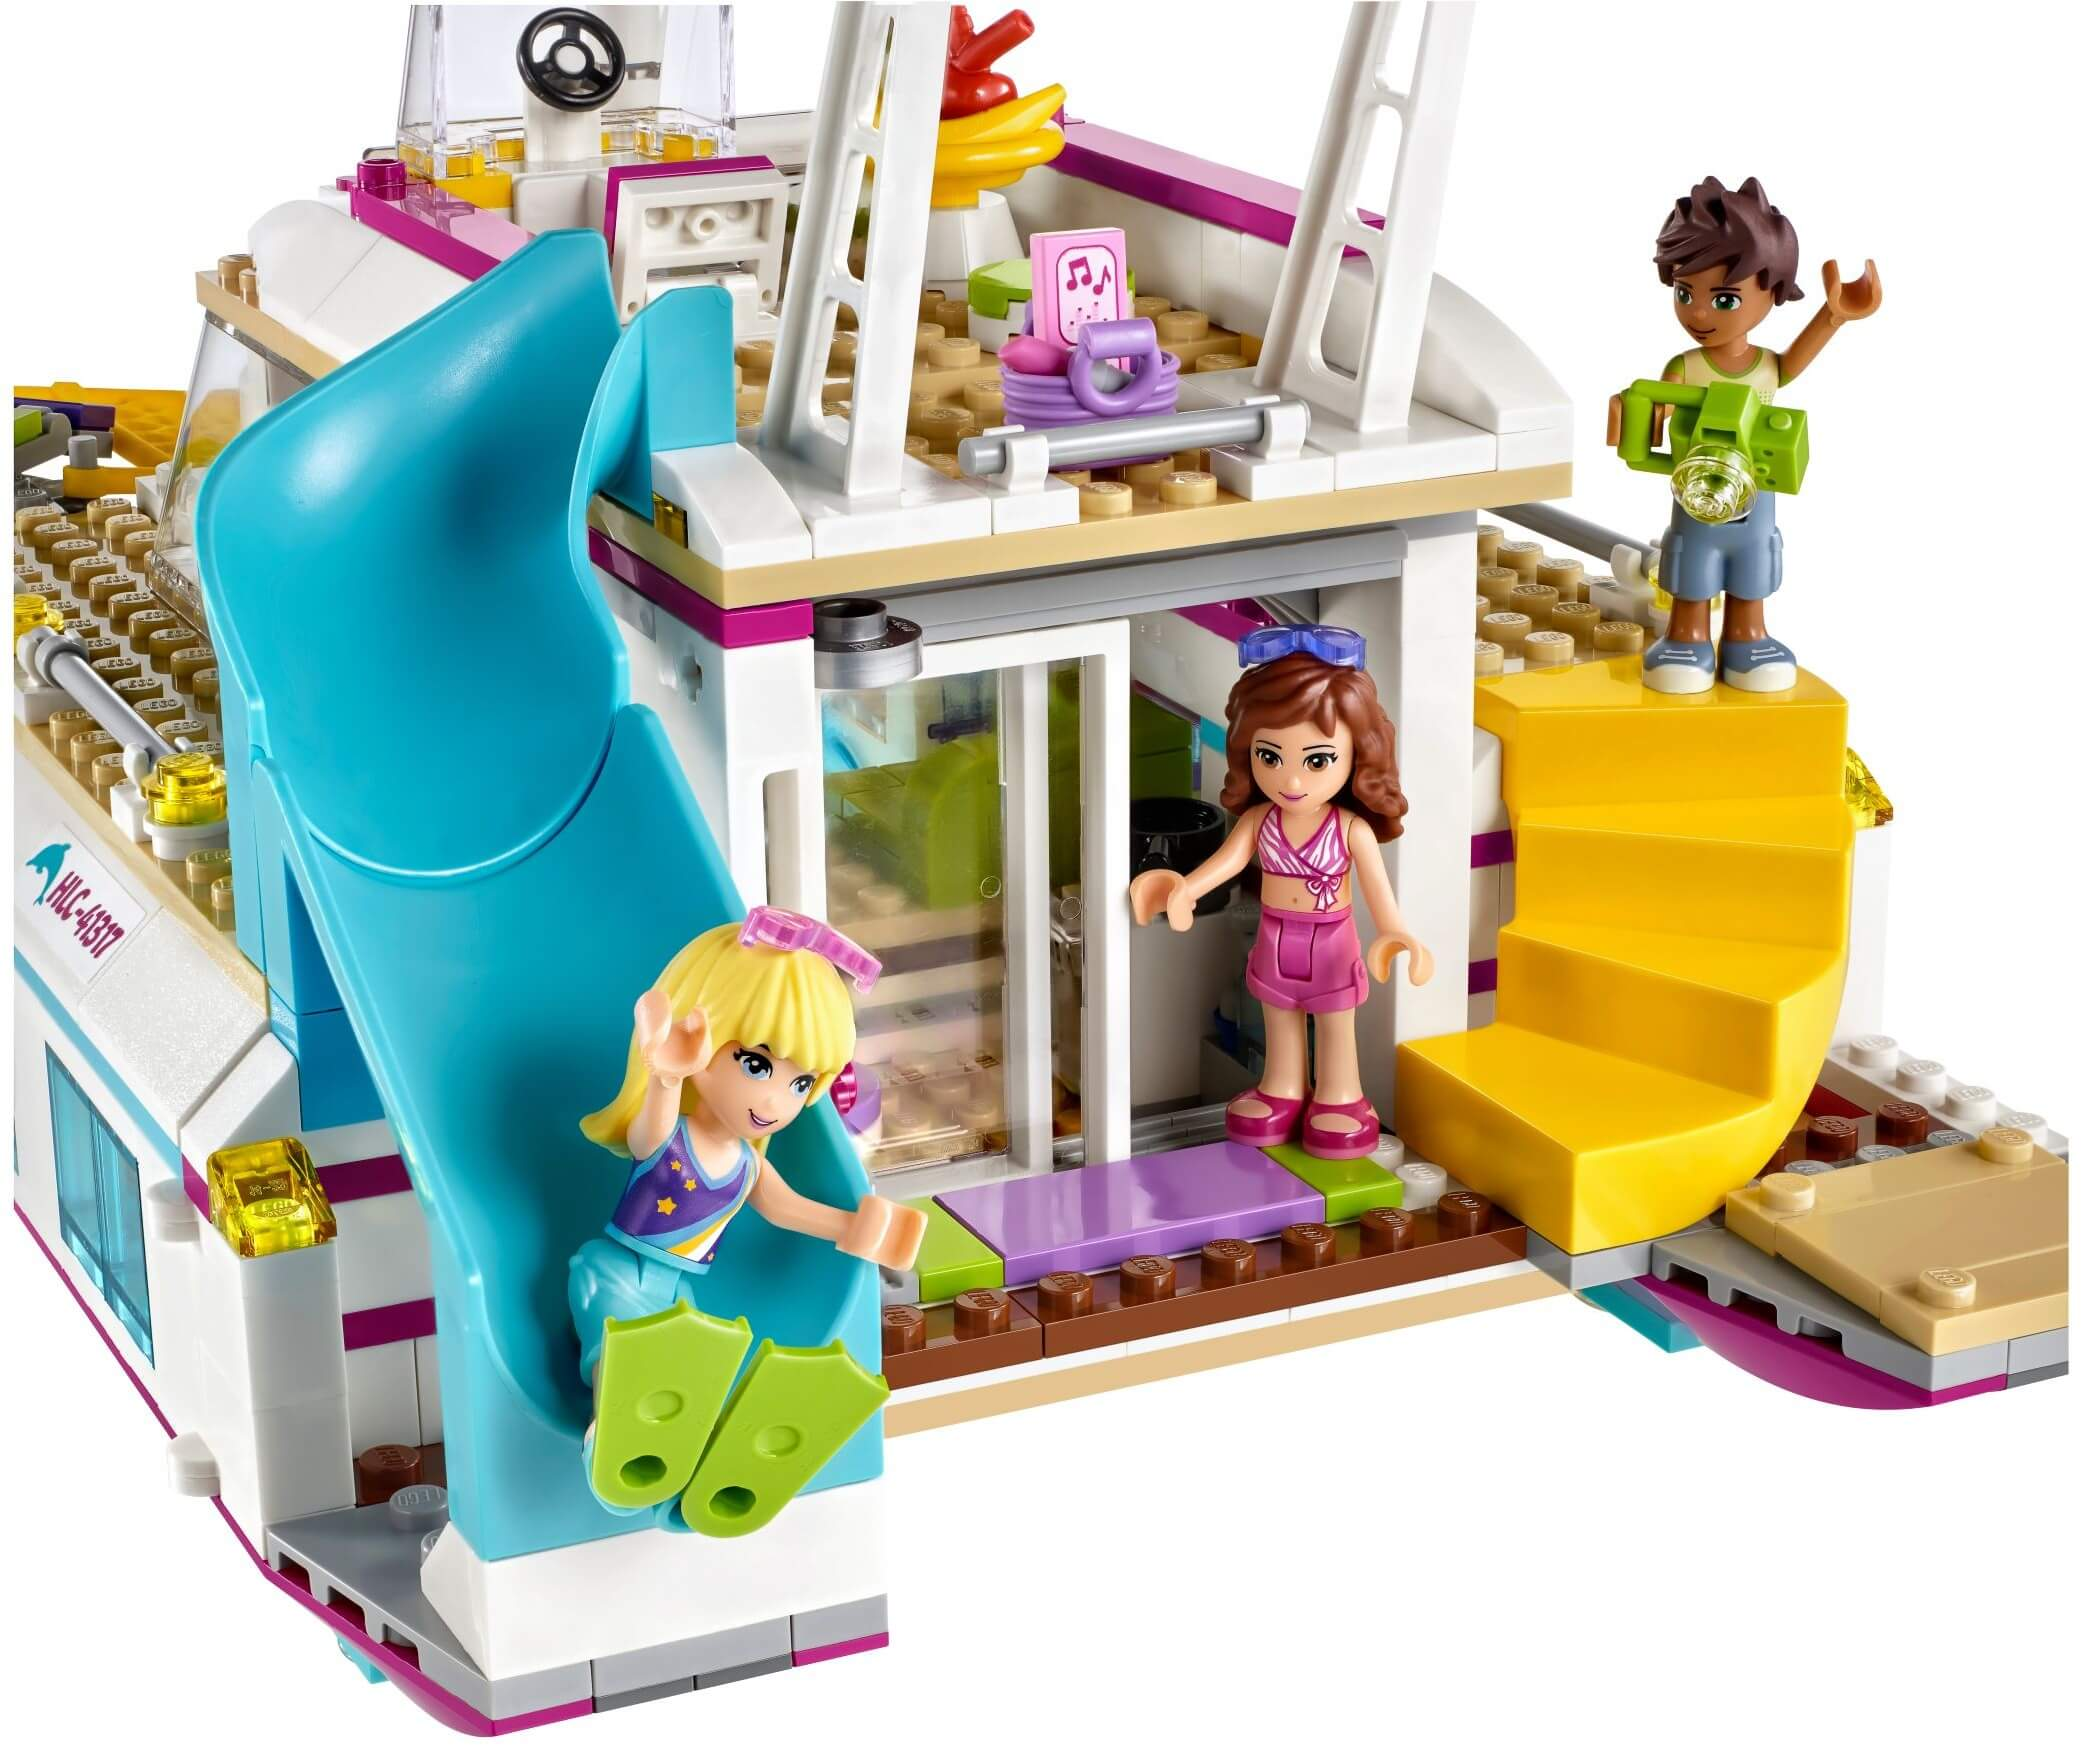 Mua đồ chơi LEGO 41317 - LEGO Friends 41317 - Thuyền Buồm Ánh Dương (LEGO Friends Sunshine Catamaran)